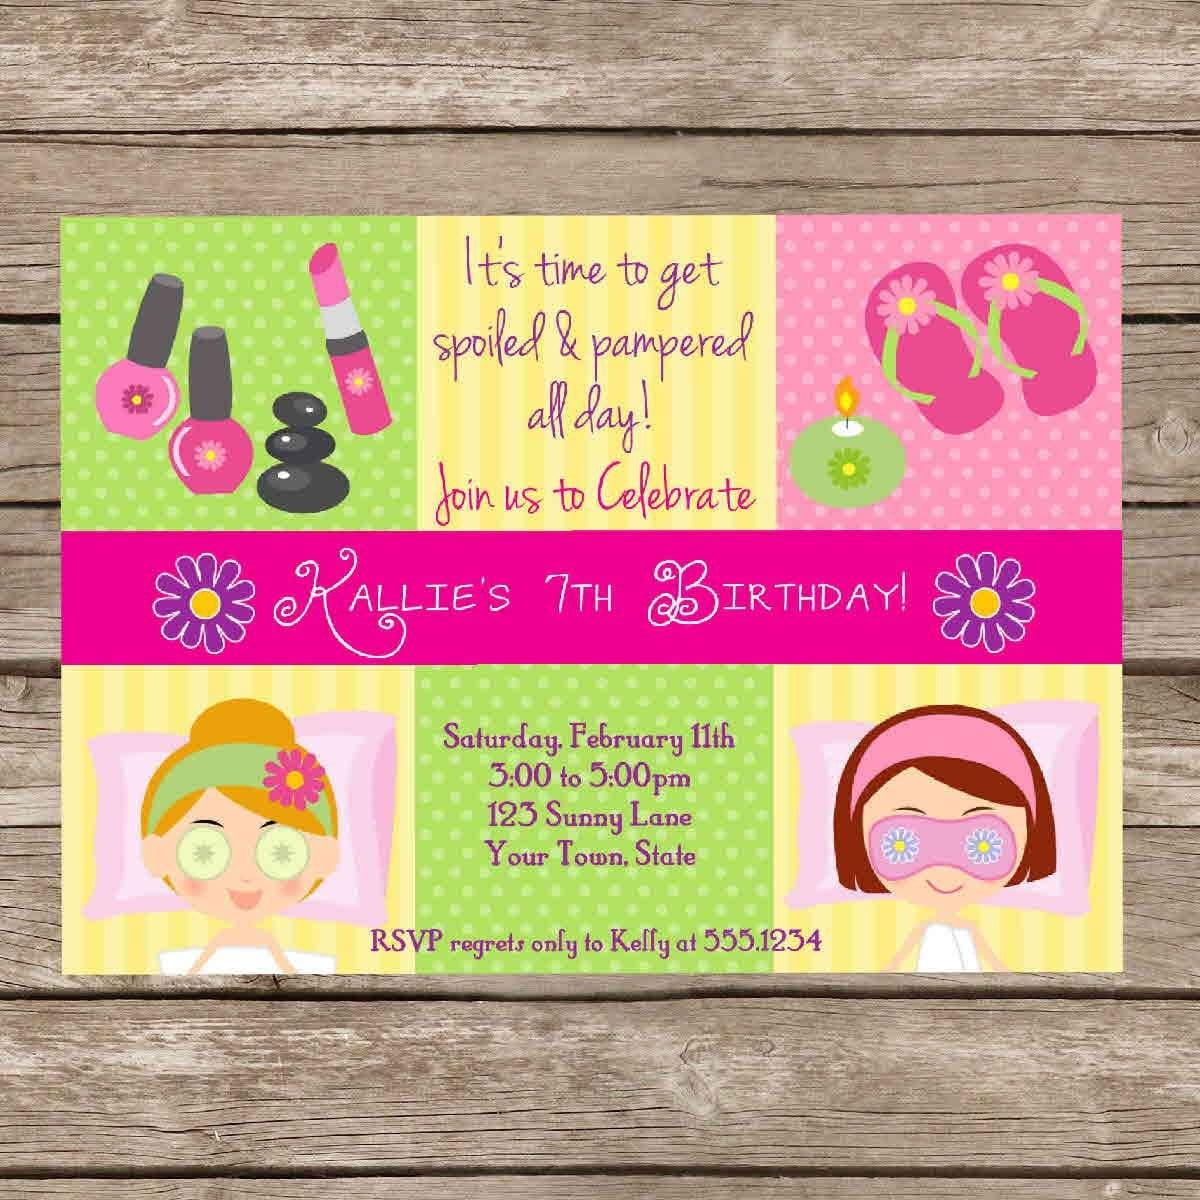 Spa Invitation Wording as perfect invitations template